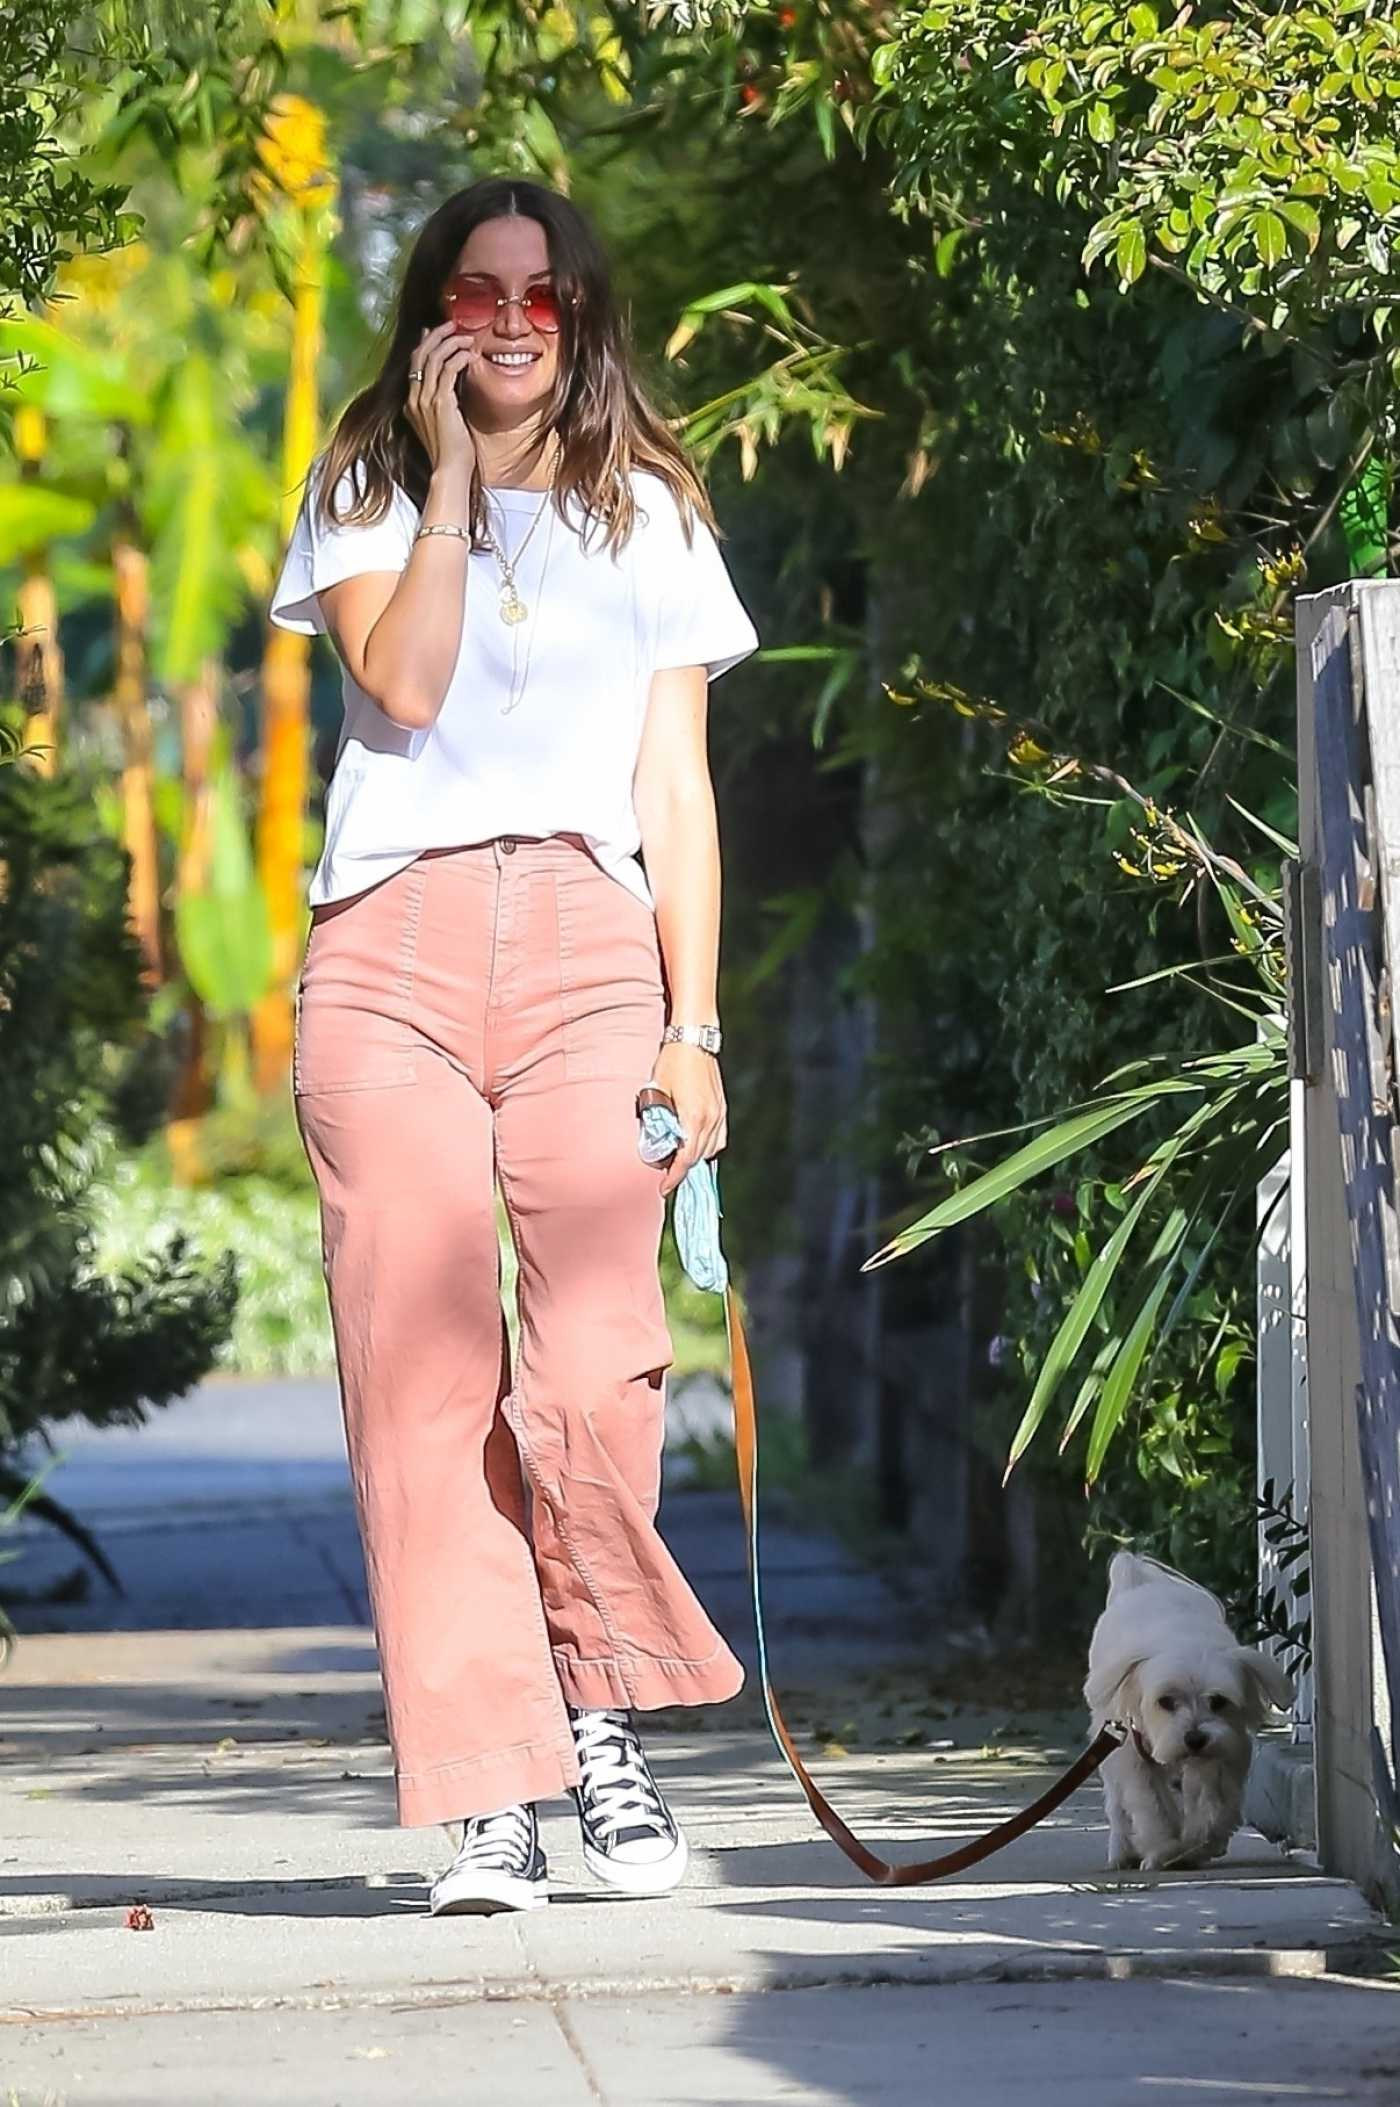 Ana de Armas in a White Tee Walks Her Dog in Venice Beach 05/07/2020